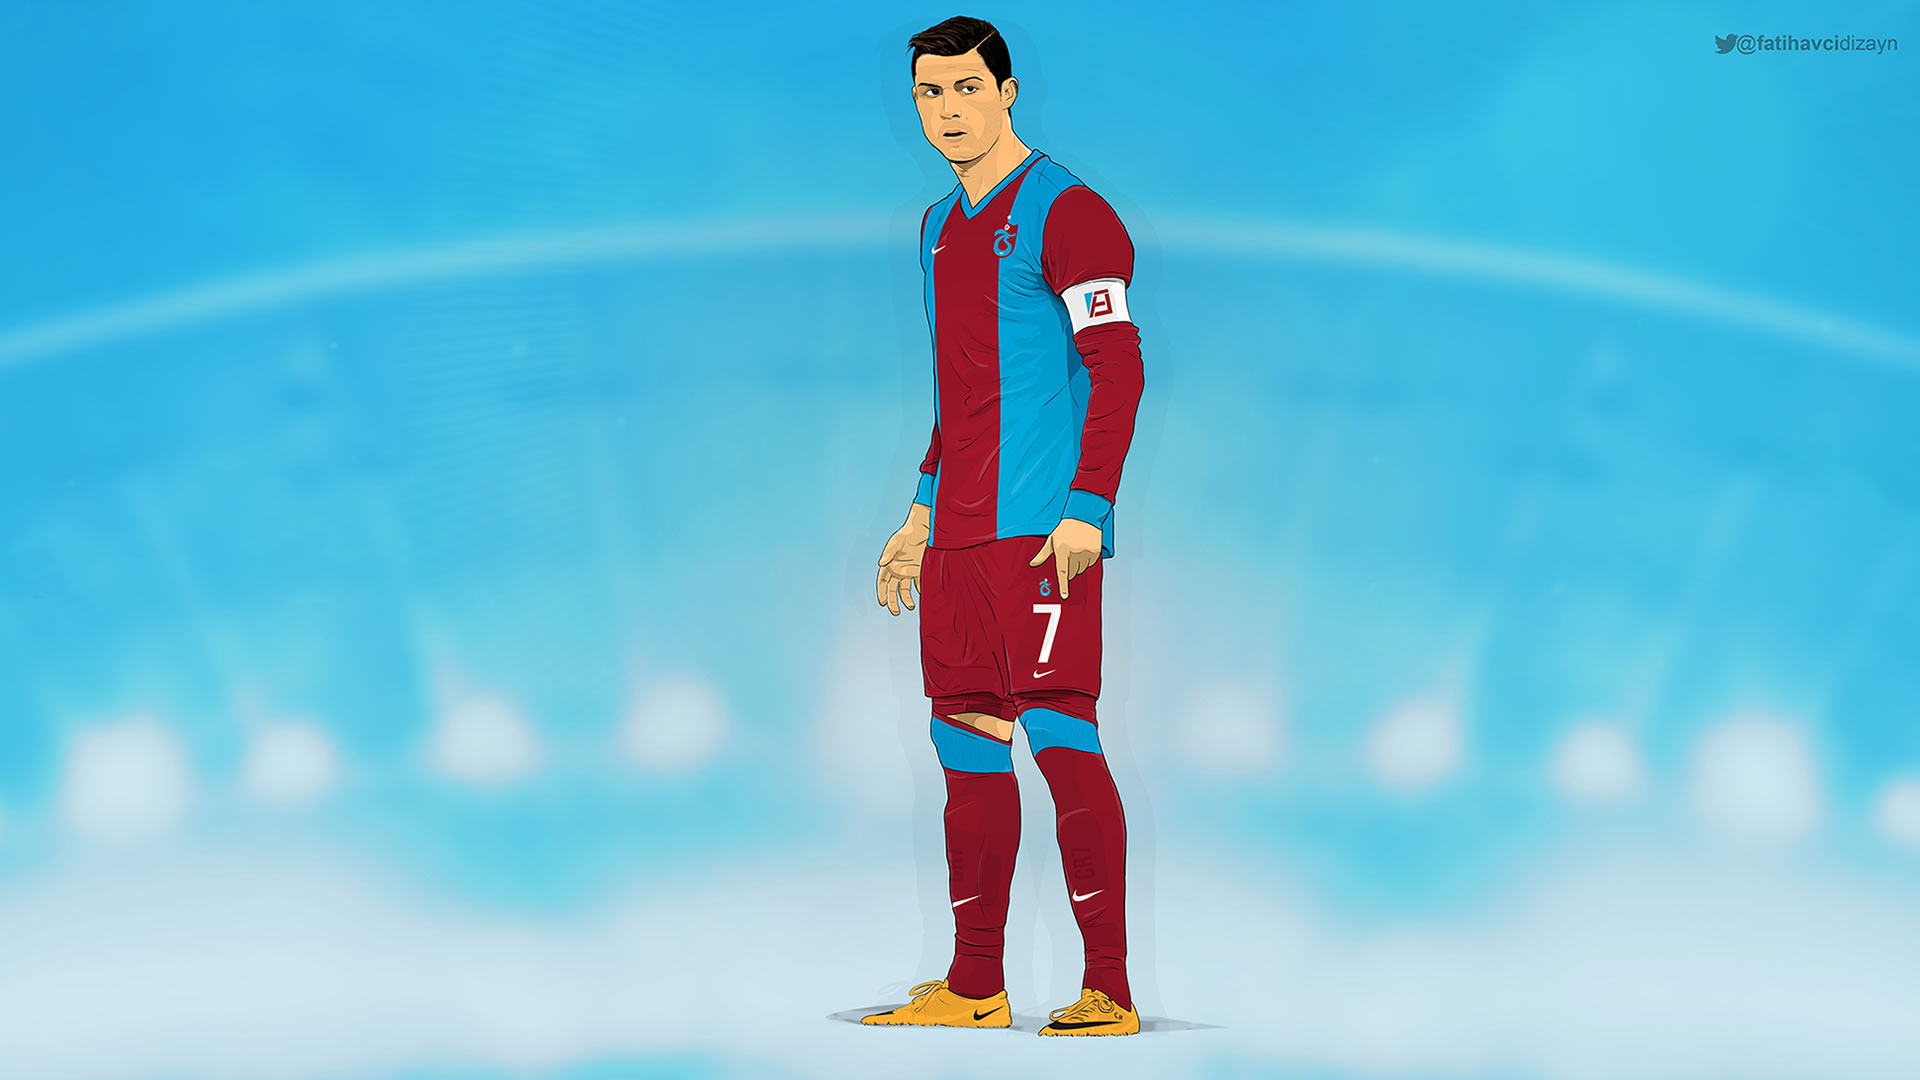 best authentic fbb8f 133a6 Cristiano Ronaldo Trabzonspor Kit - Cristiano Ronaldo Wallpapers